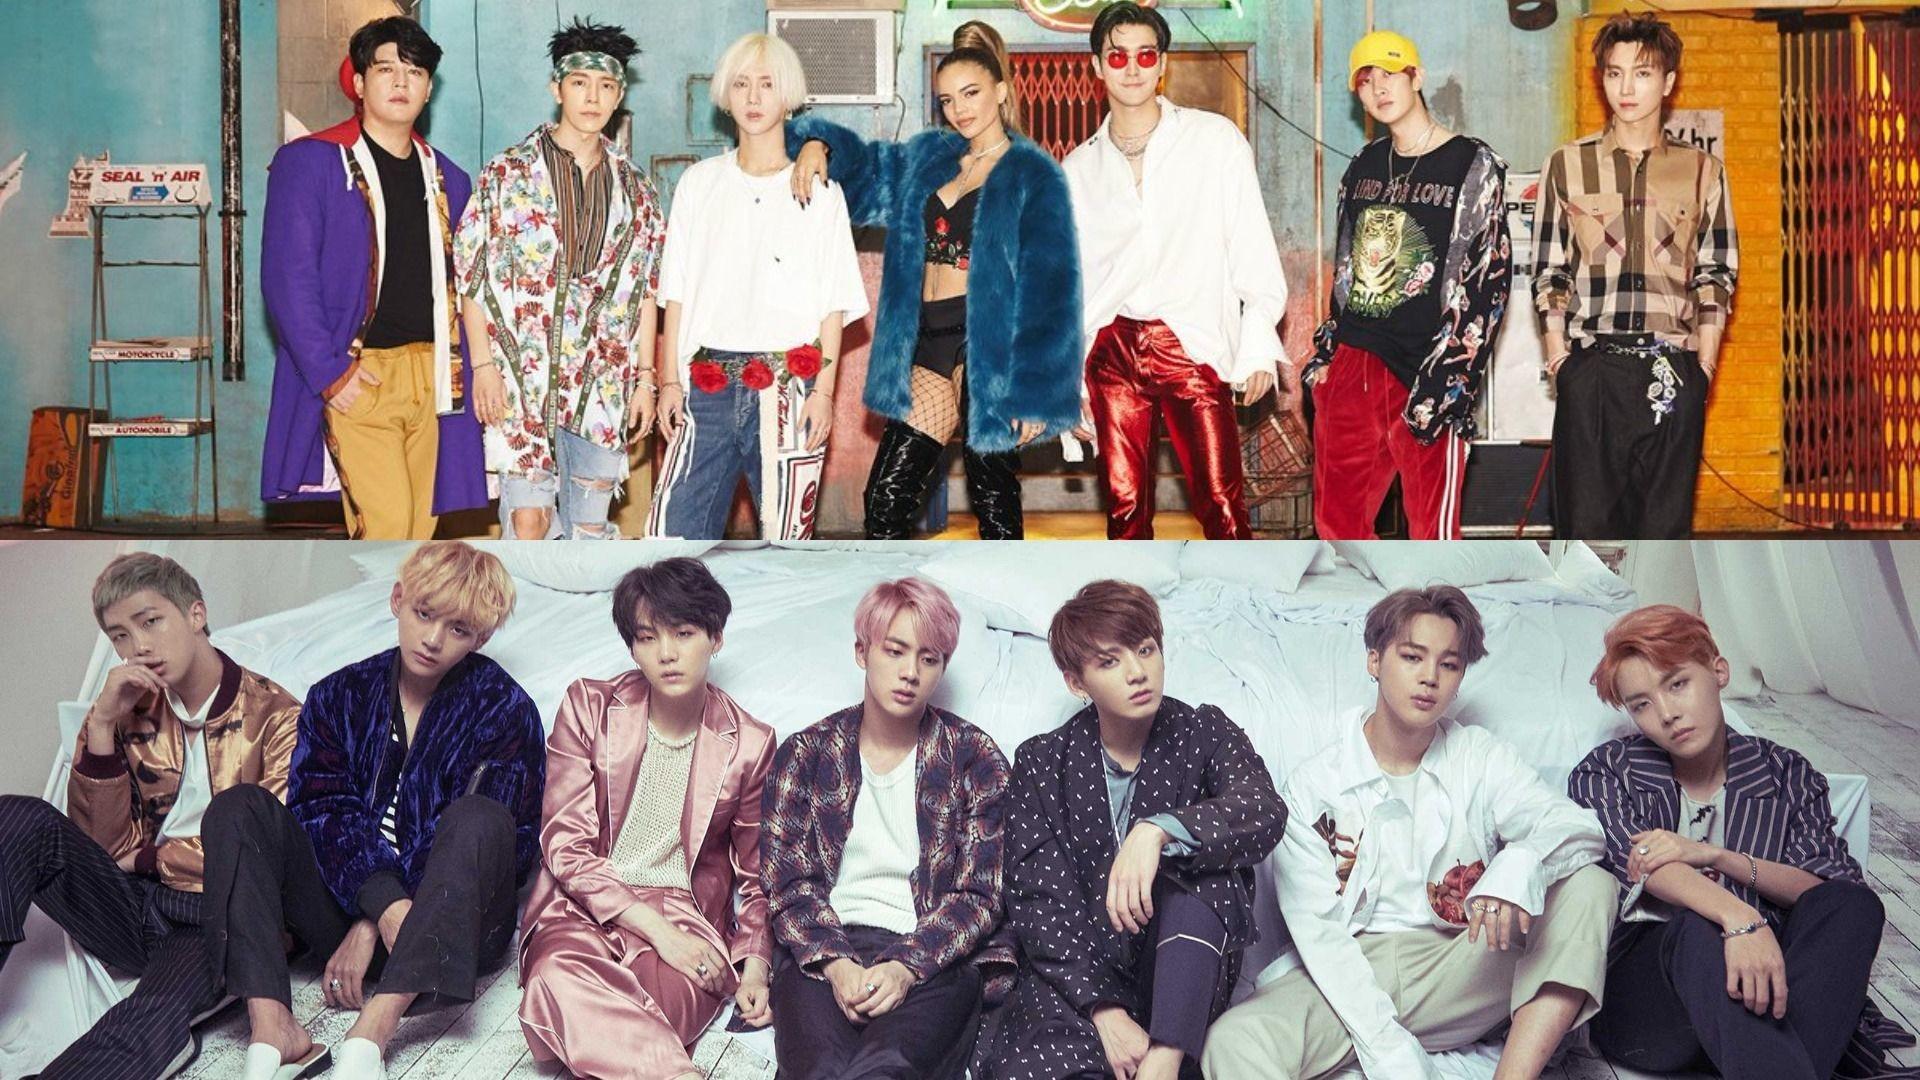 Super Junior Wallpaper 2018 75 Images